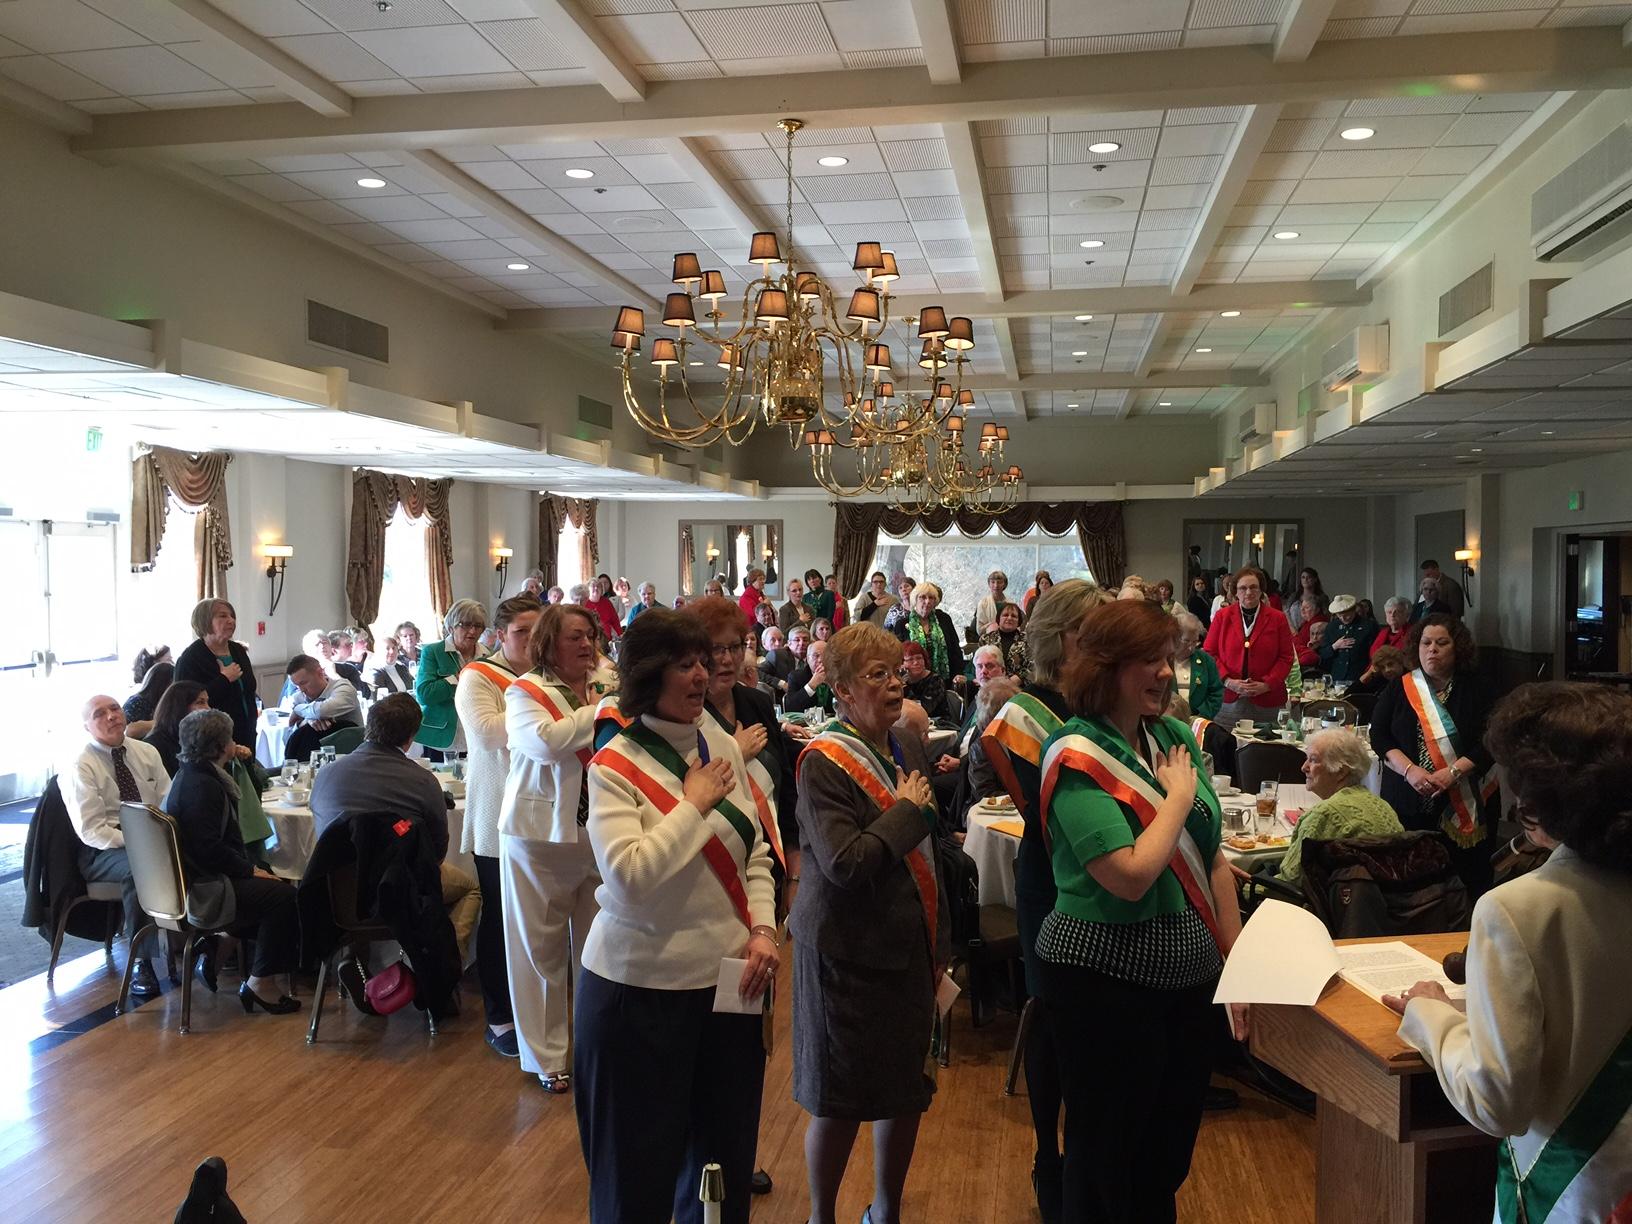 Div 11 President getting installed 2016 St Brigids Mass